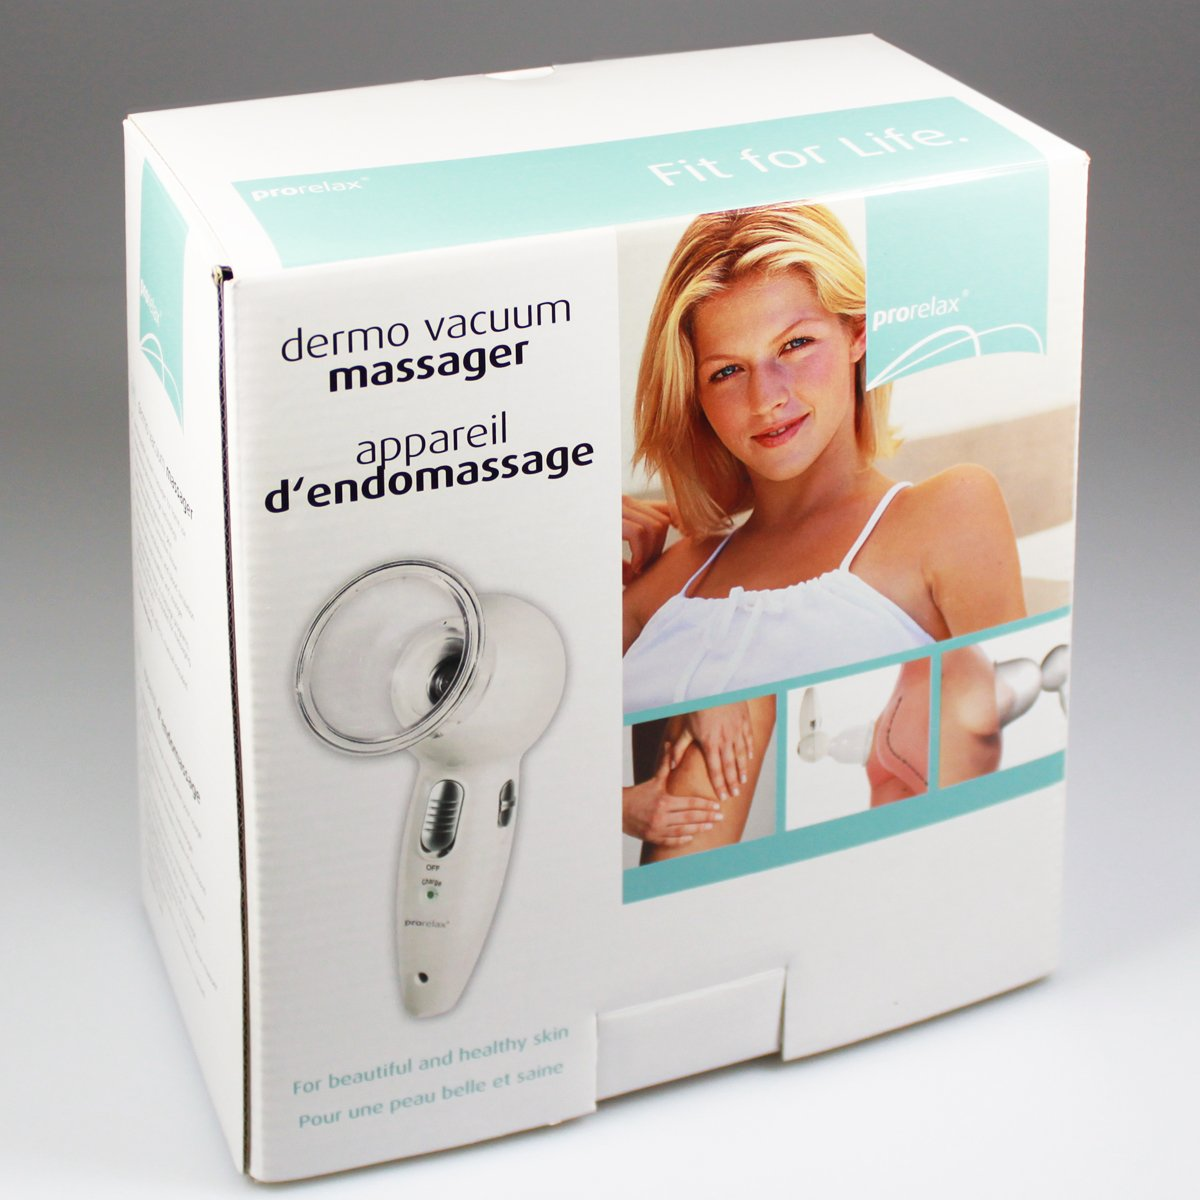 beauty quick dermo vacuum massager